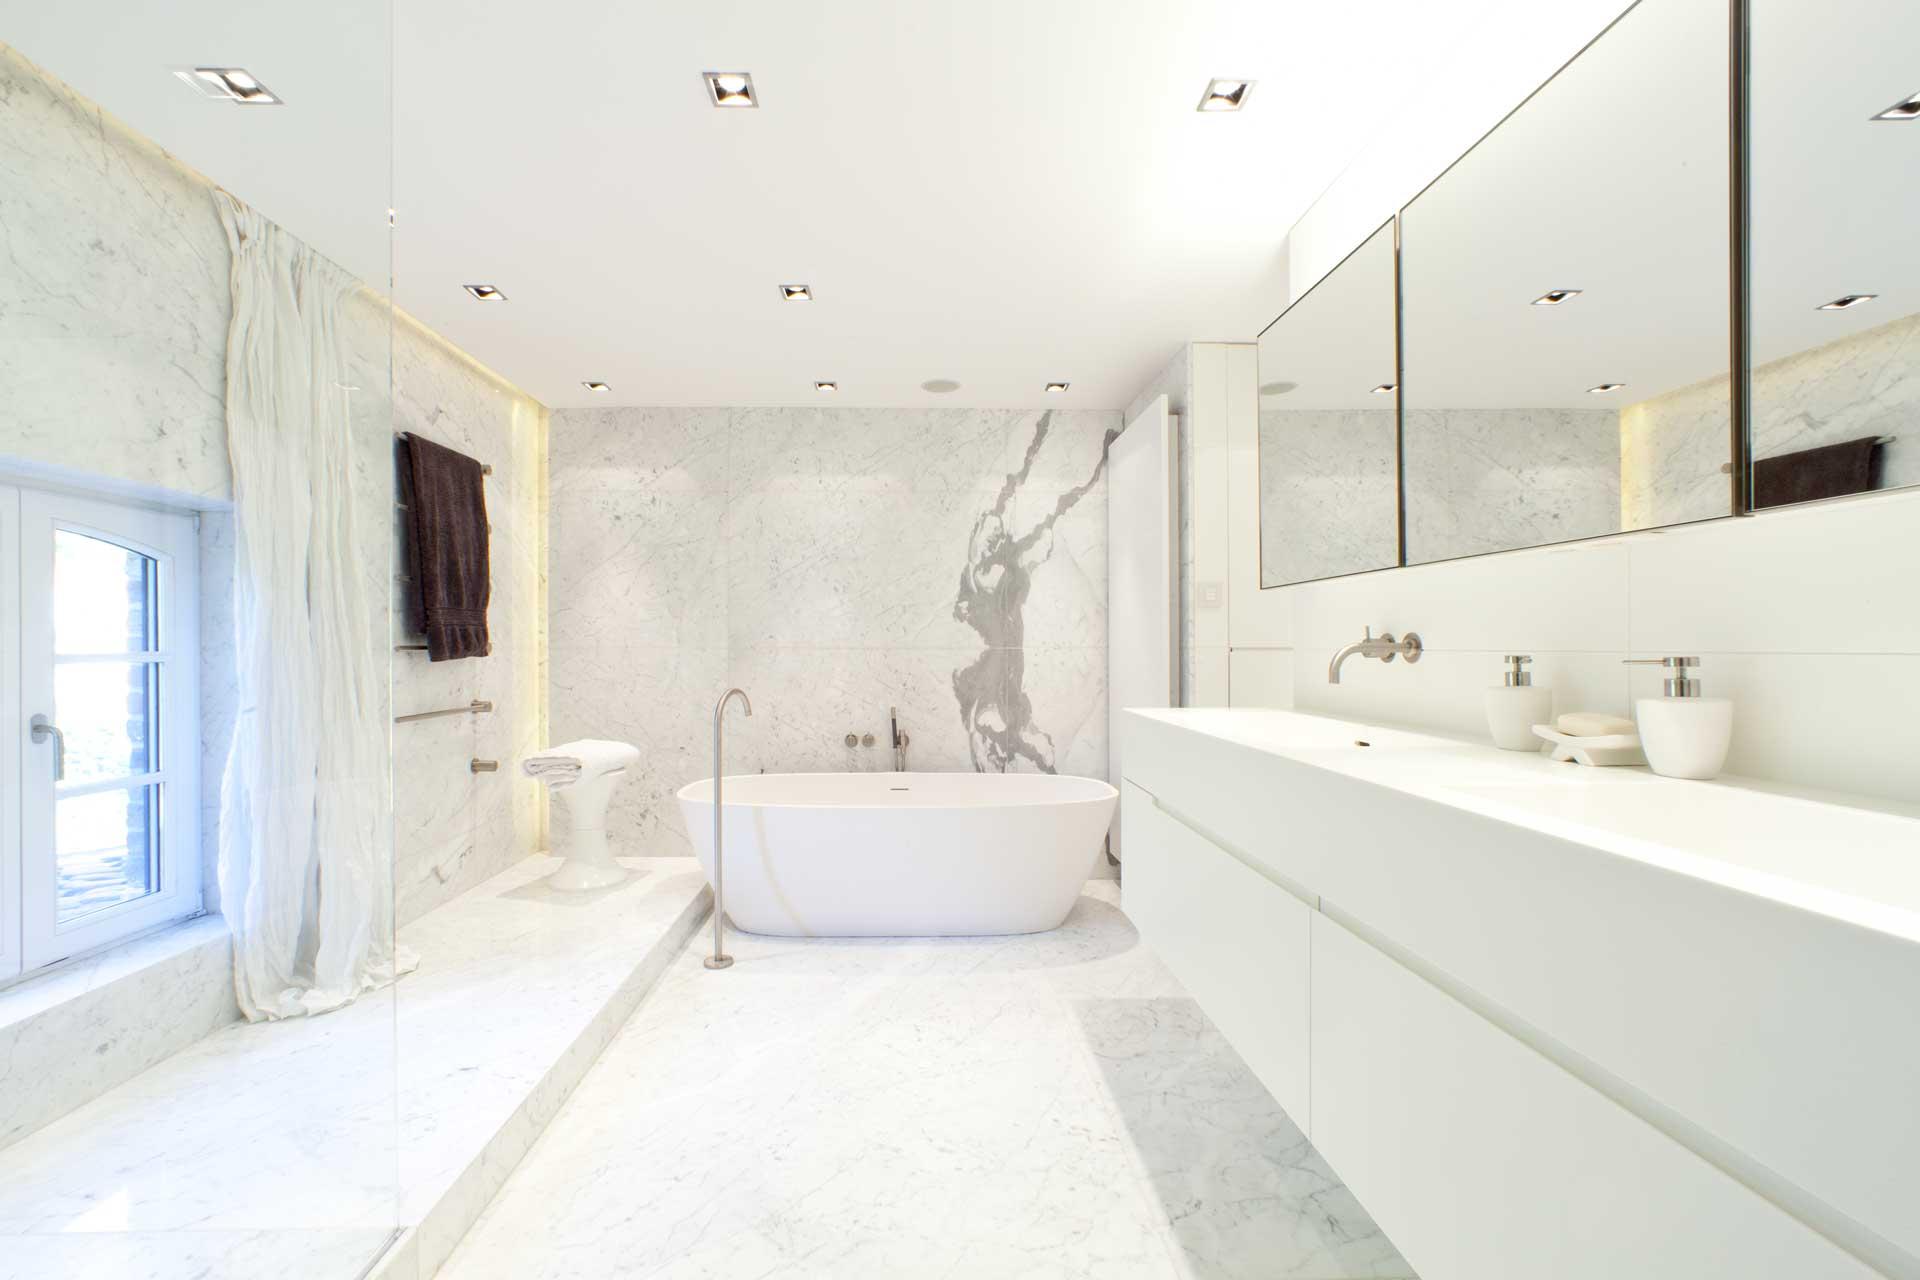 Radermacher_bad_carrara_statuario_statuaire_venato_omg_wow_italienischer-marmor